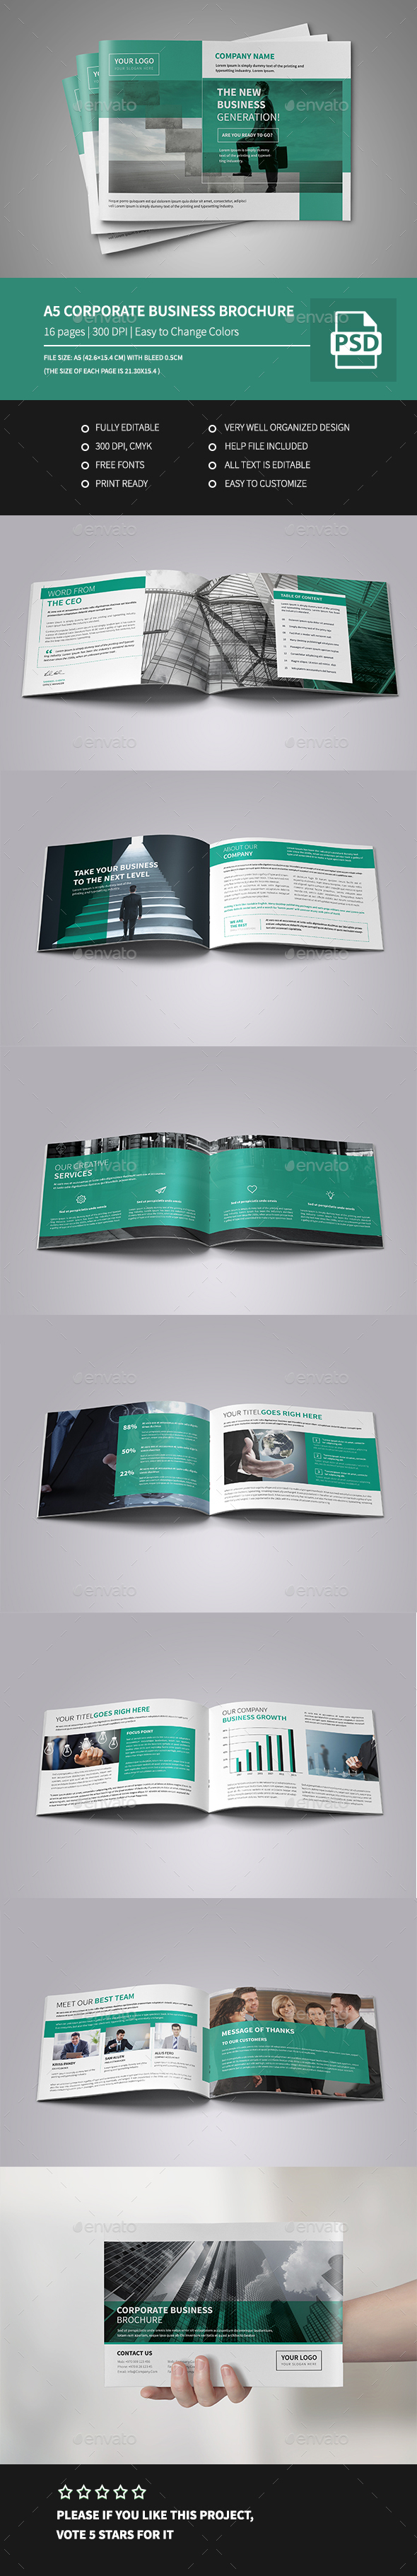 A5 Corporate Business Brochure  - Corporate Brochures